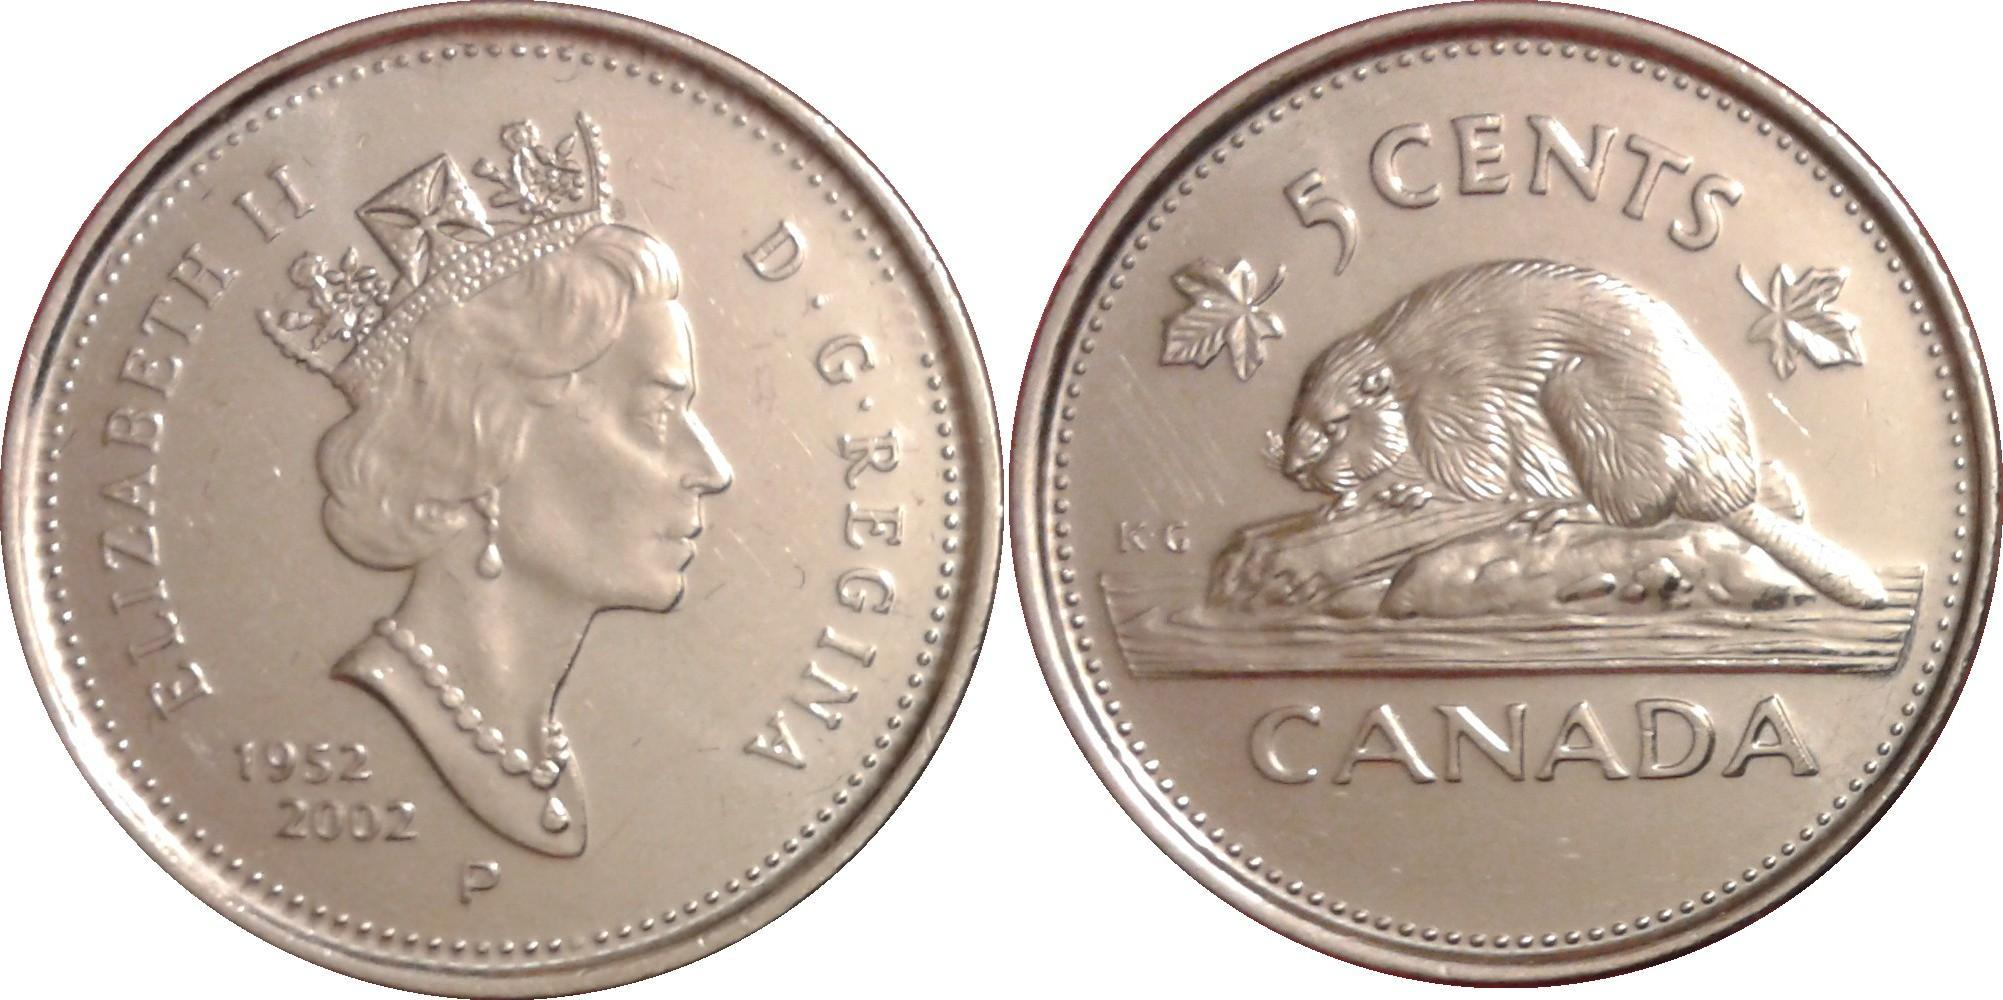 2003 Canada Old Effigy 10 Cents BU